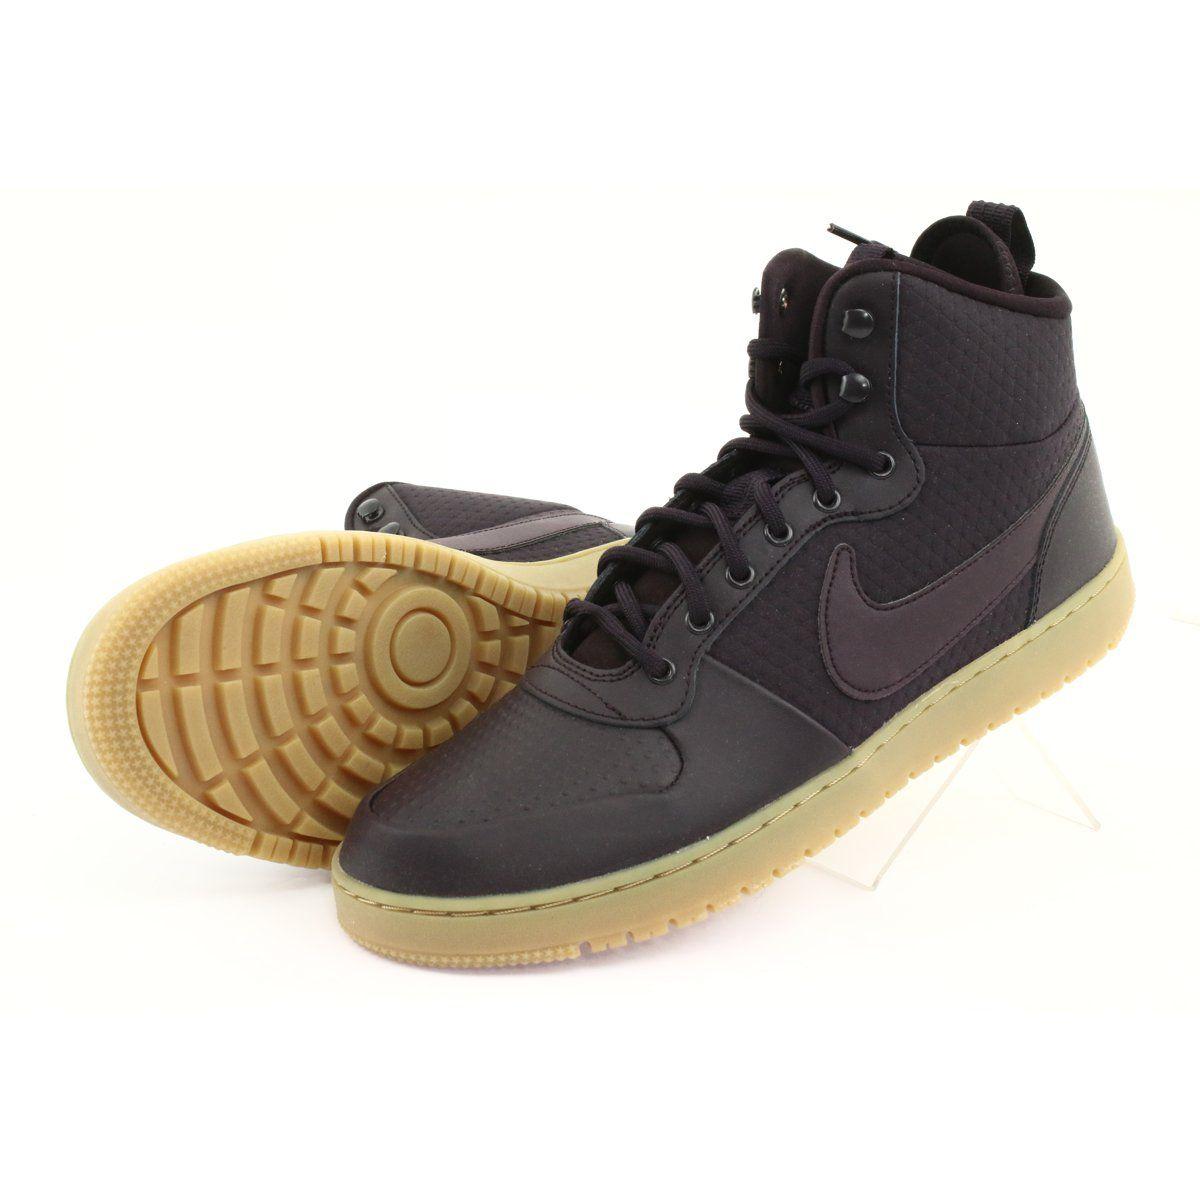 Buty Nike Ebernon Mid Winter M Aq8754 600 Wielokolorowe Nike High Top Sneakers Shoes